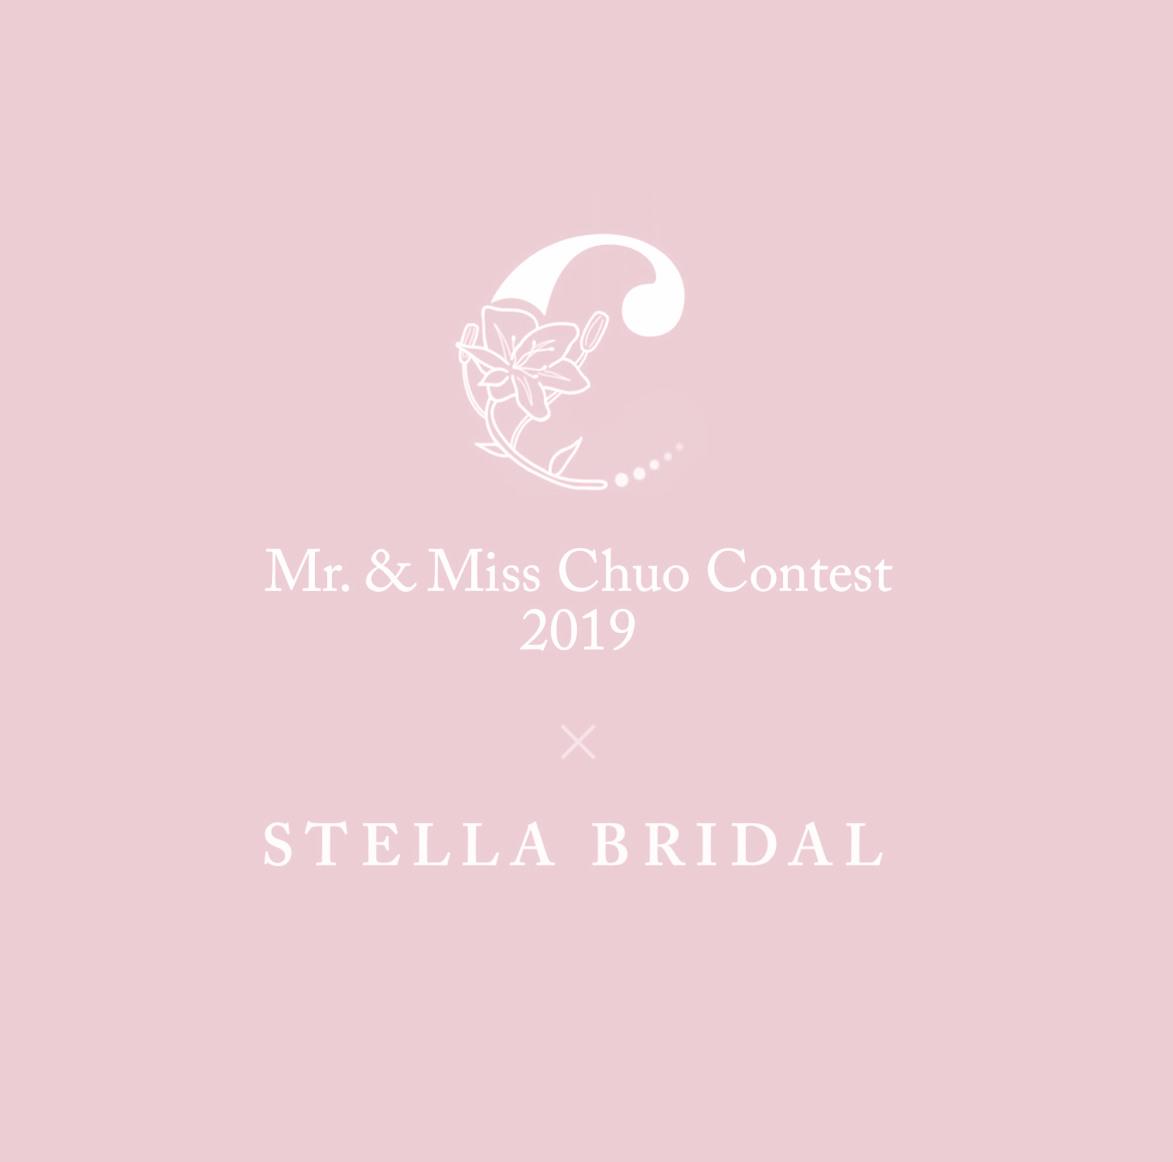 Mr. & Miss Chuo Contest 2019 に協賛させて頂きました